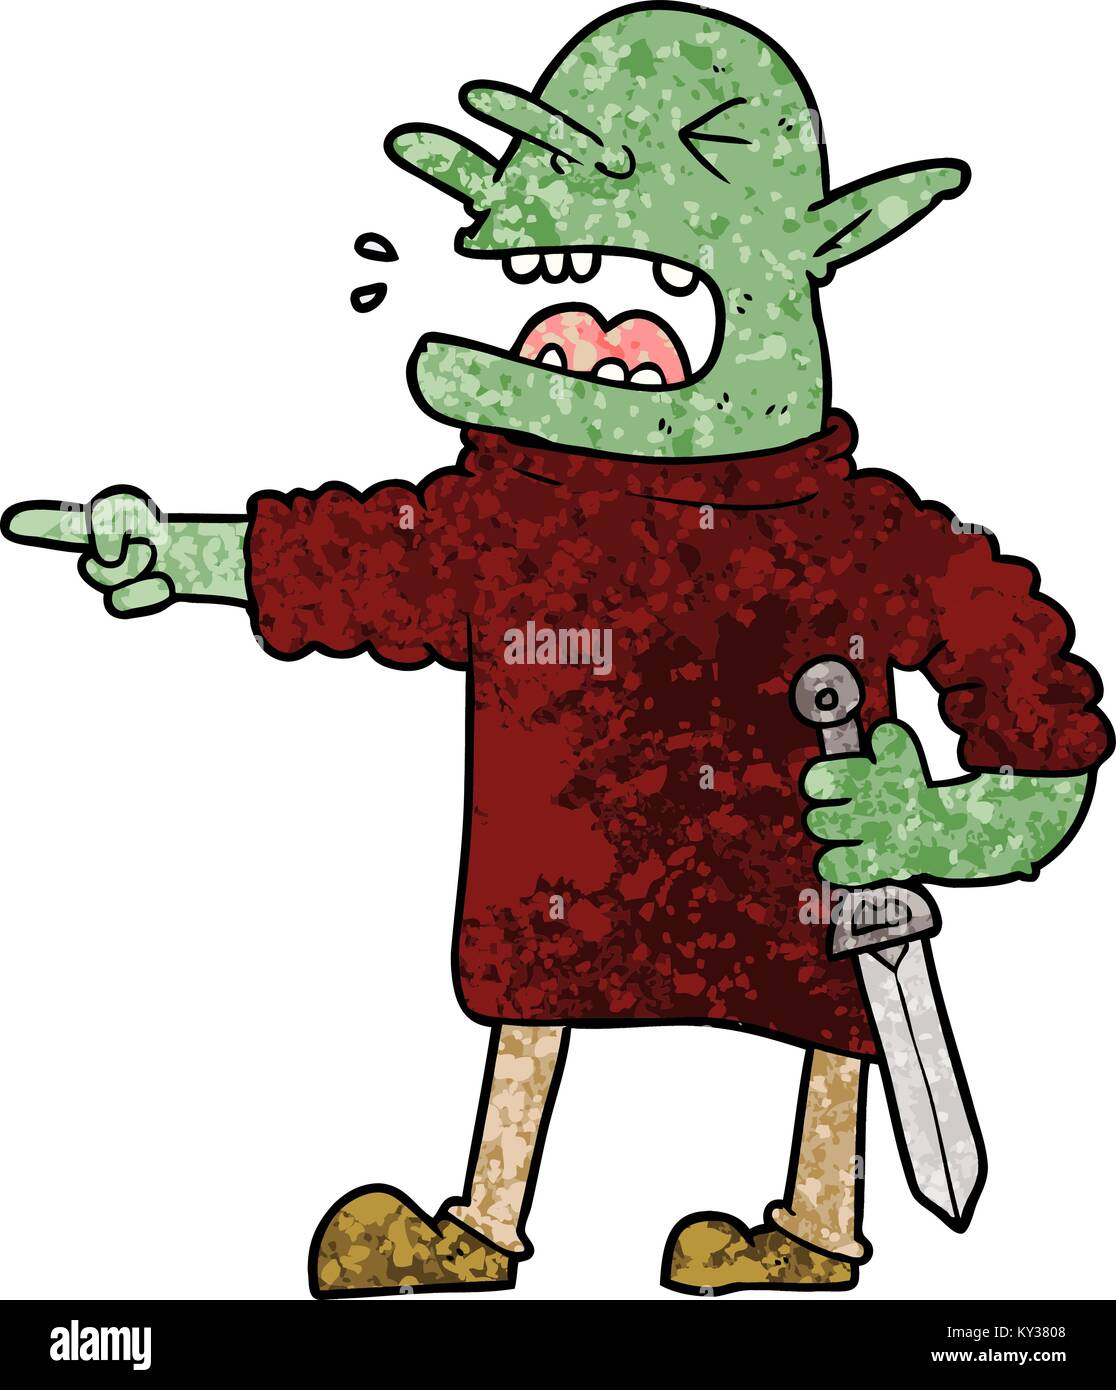 cartoon goblin with knife - Stock Image